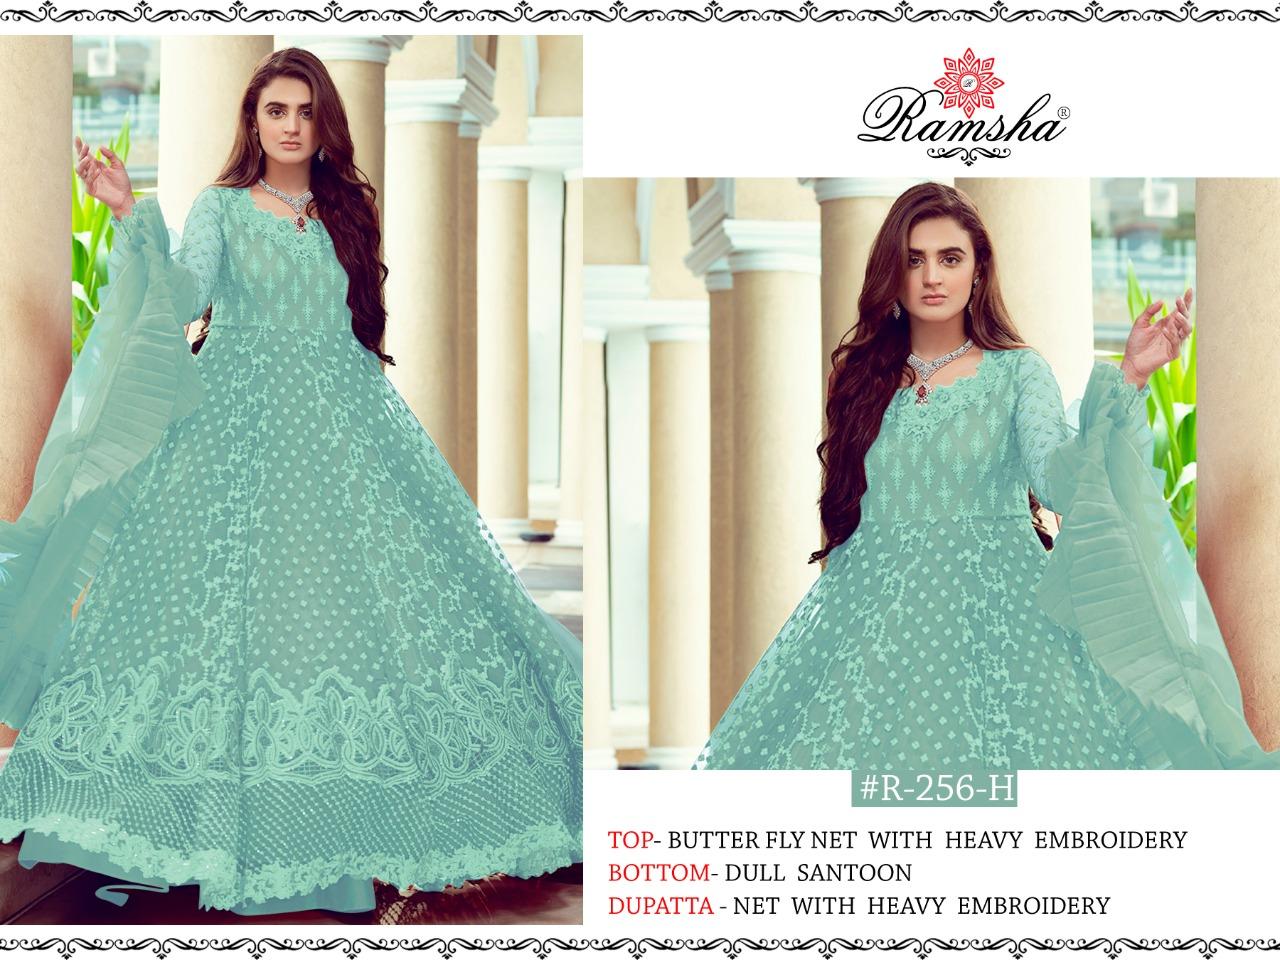 Ramsha R 256 Nx Designer Butterfly Net With Heavy Embroidery Work Partywear Pakistani Pattern Suits In Singles